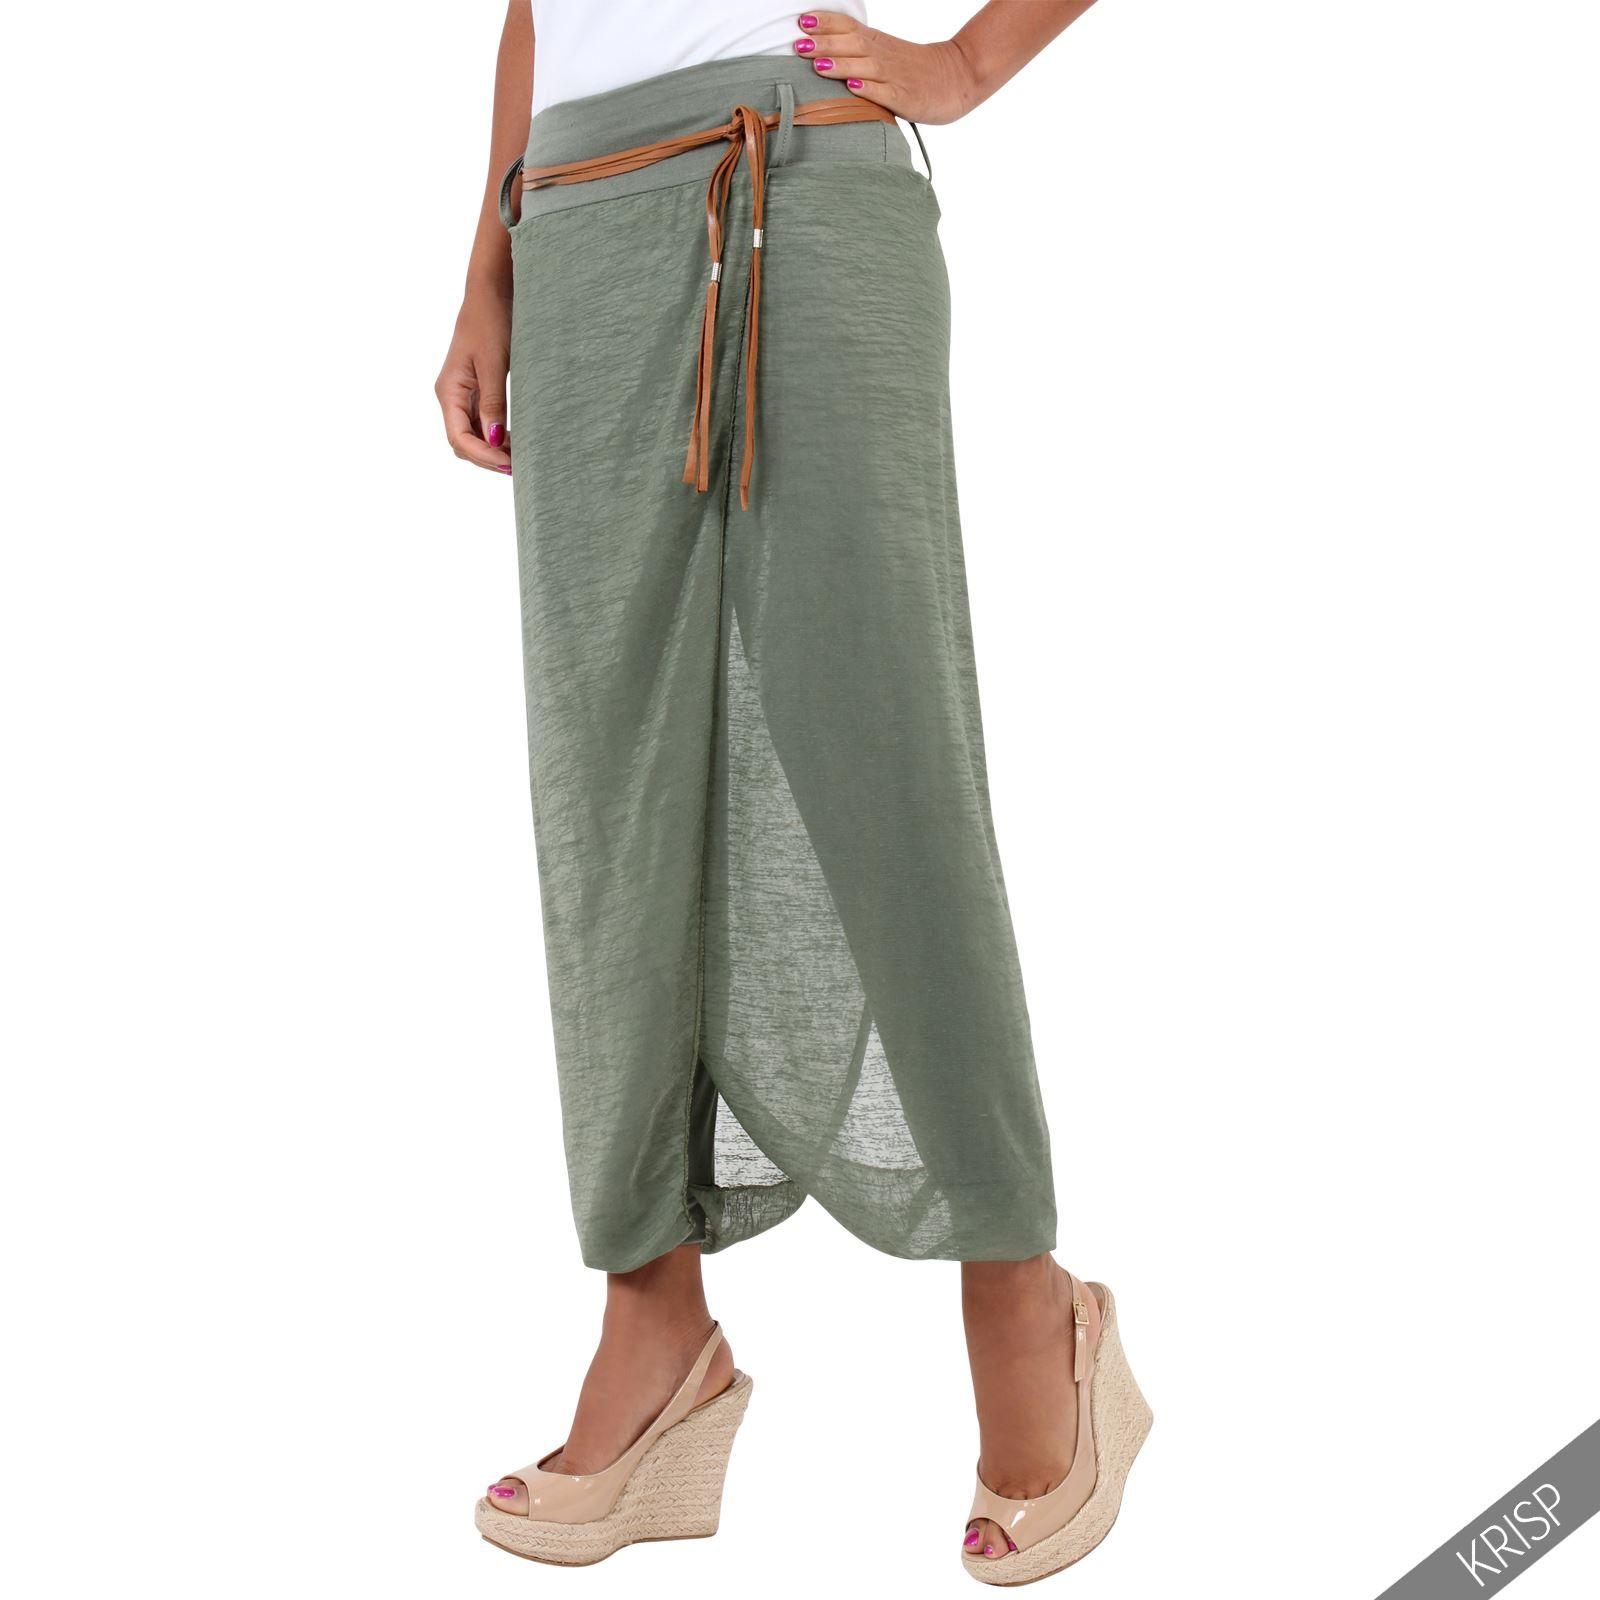 großer Verkauf großartige Qualität neue sorten Damen Harem Sommer Hose Hosenrock Wickeloptik Boho Aladin ...